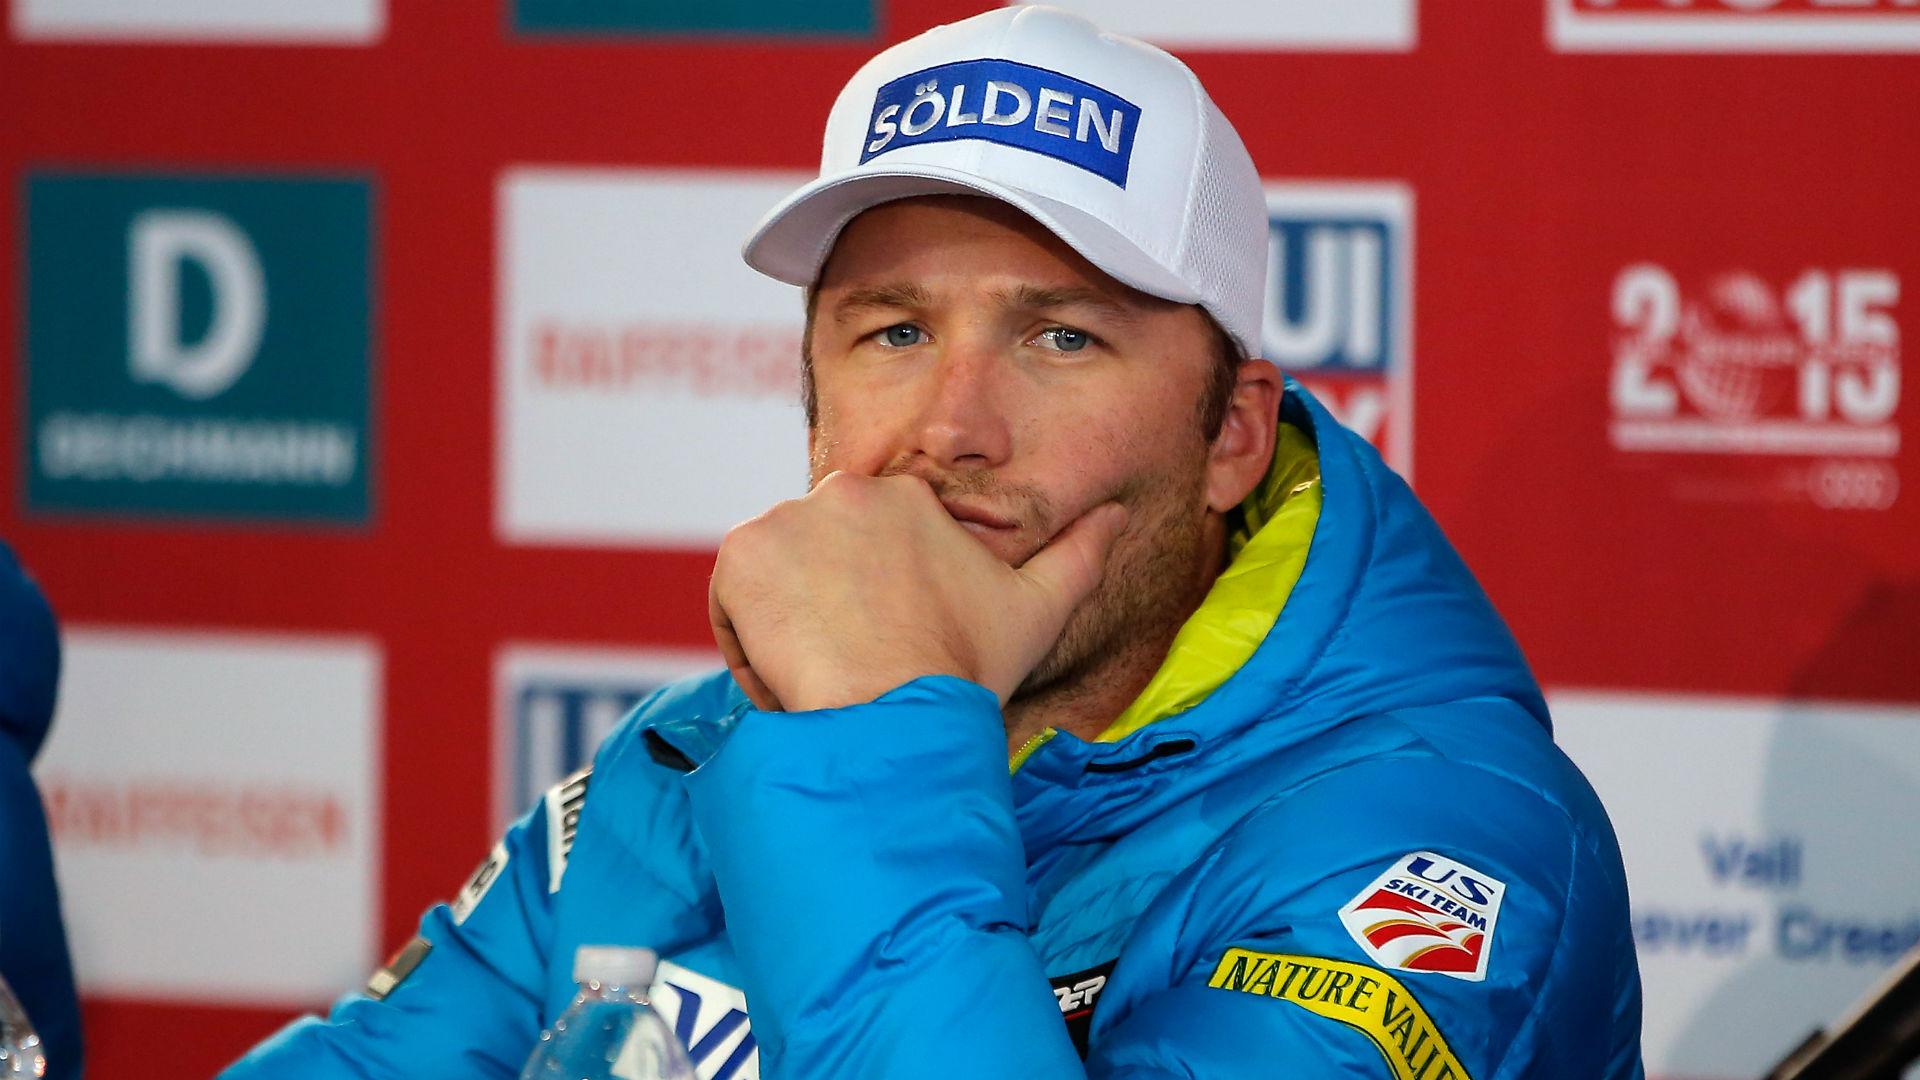 Former Olympic skier Bode Miller's infant daughter drowns